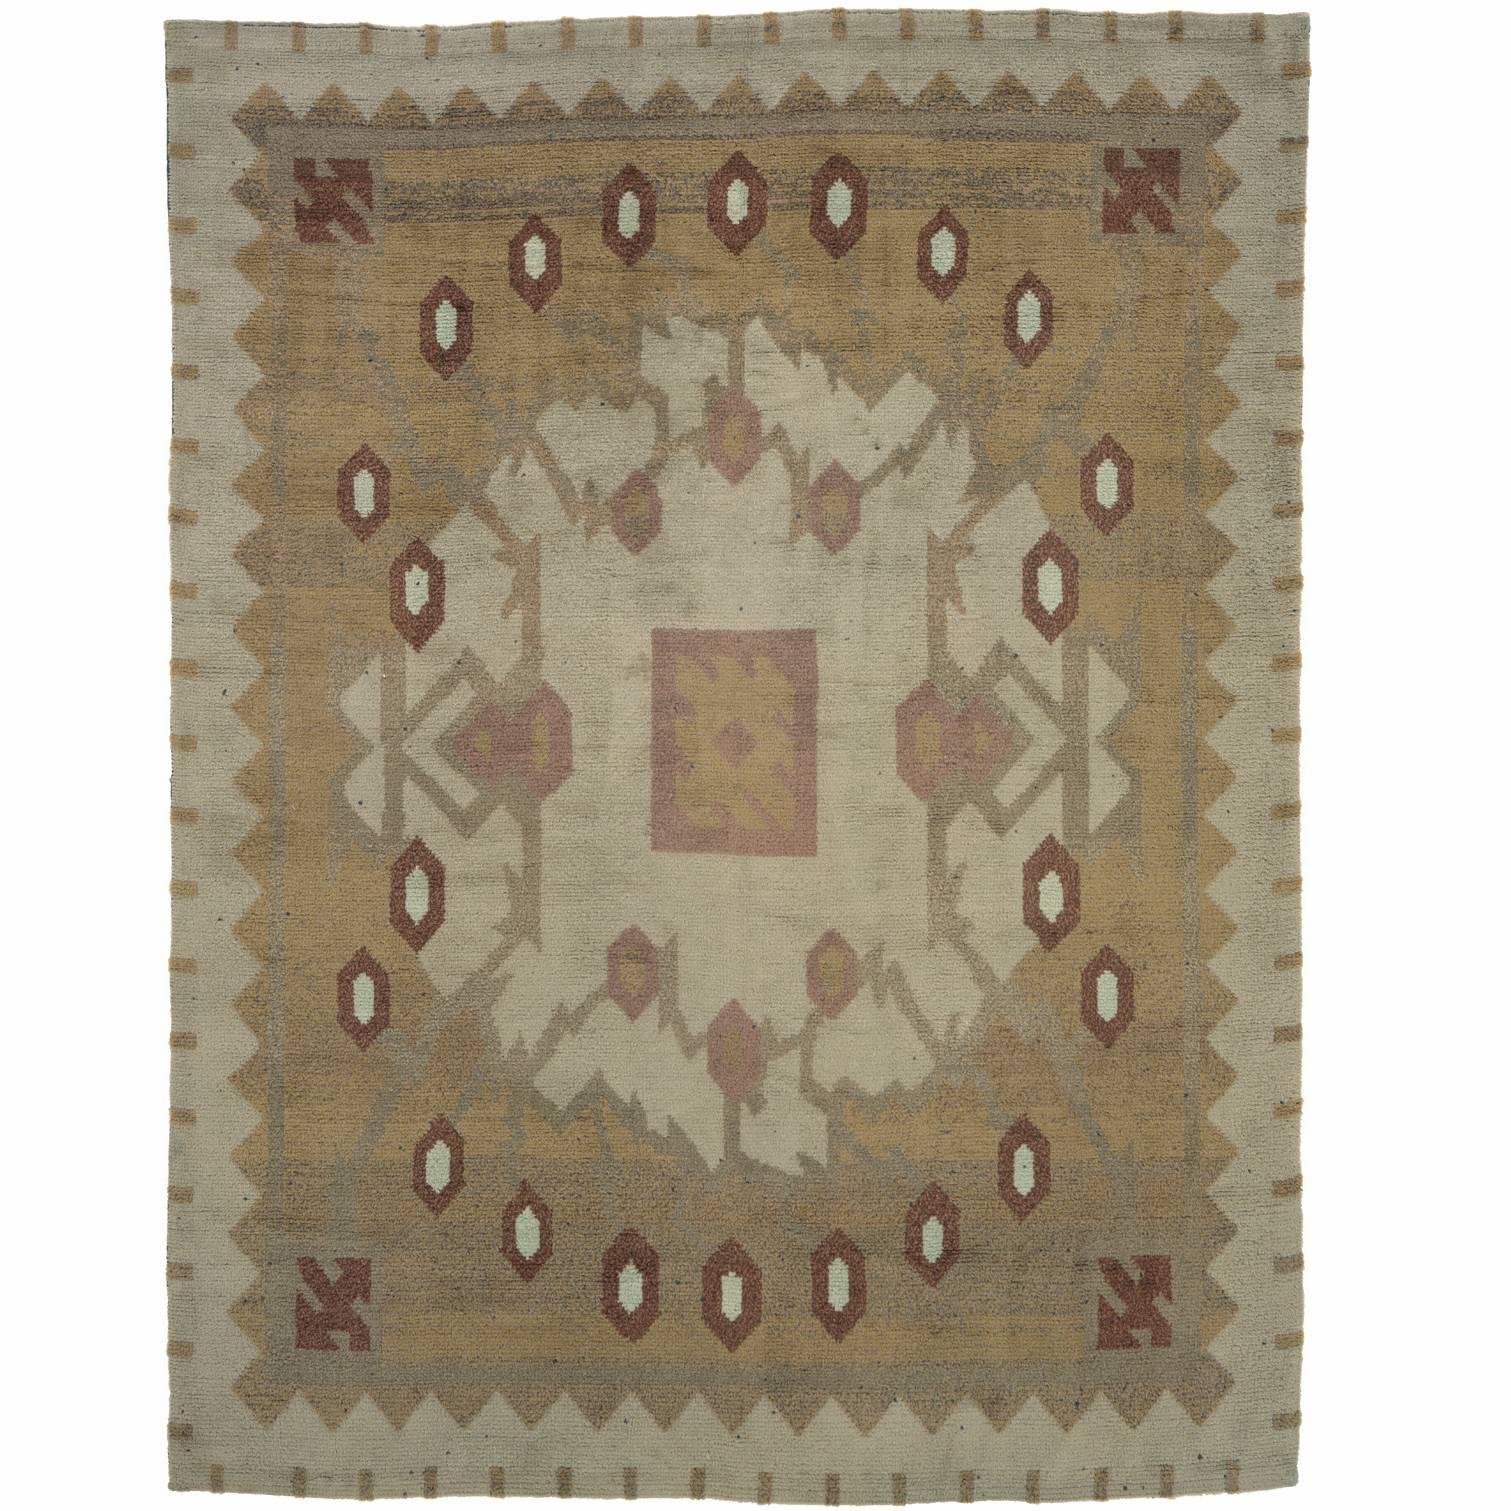 20th Century Swedish Pile-Weave Carpet by Eva Brummer